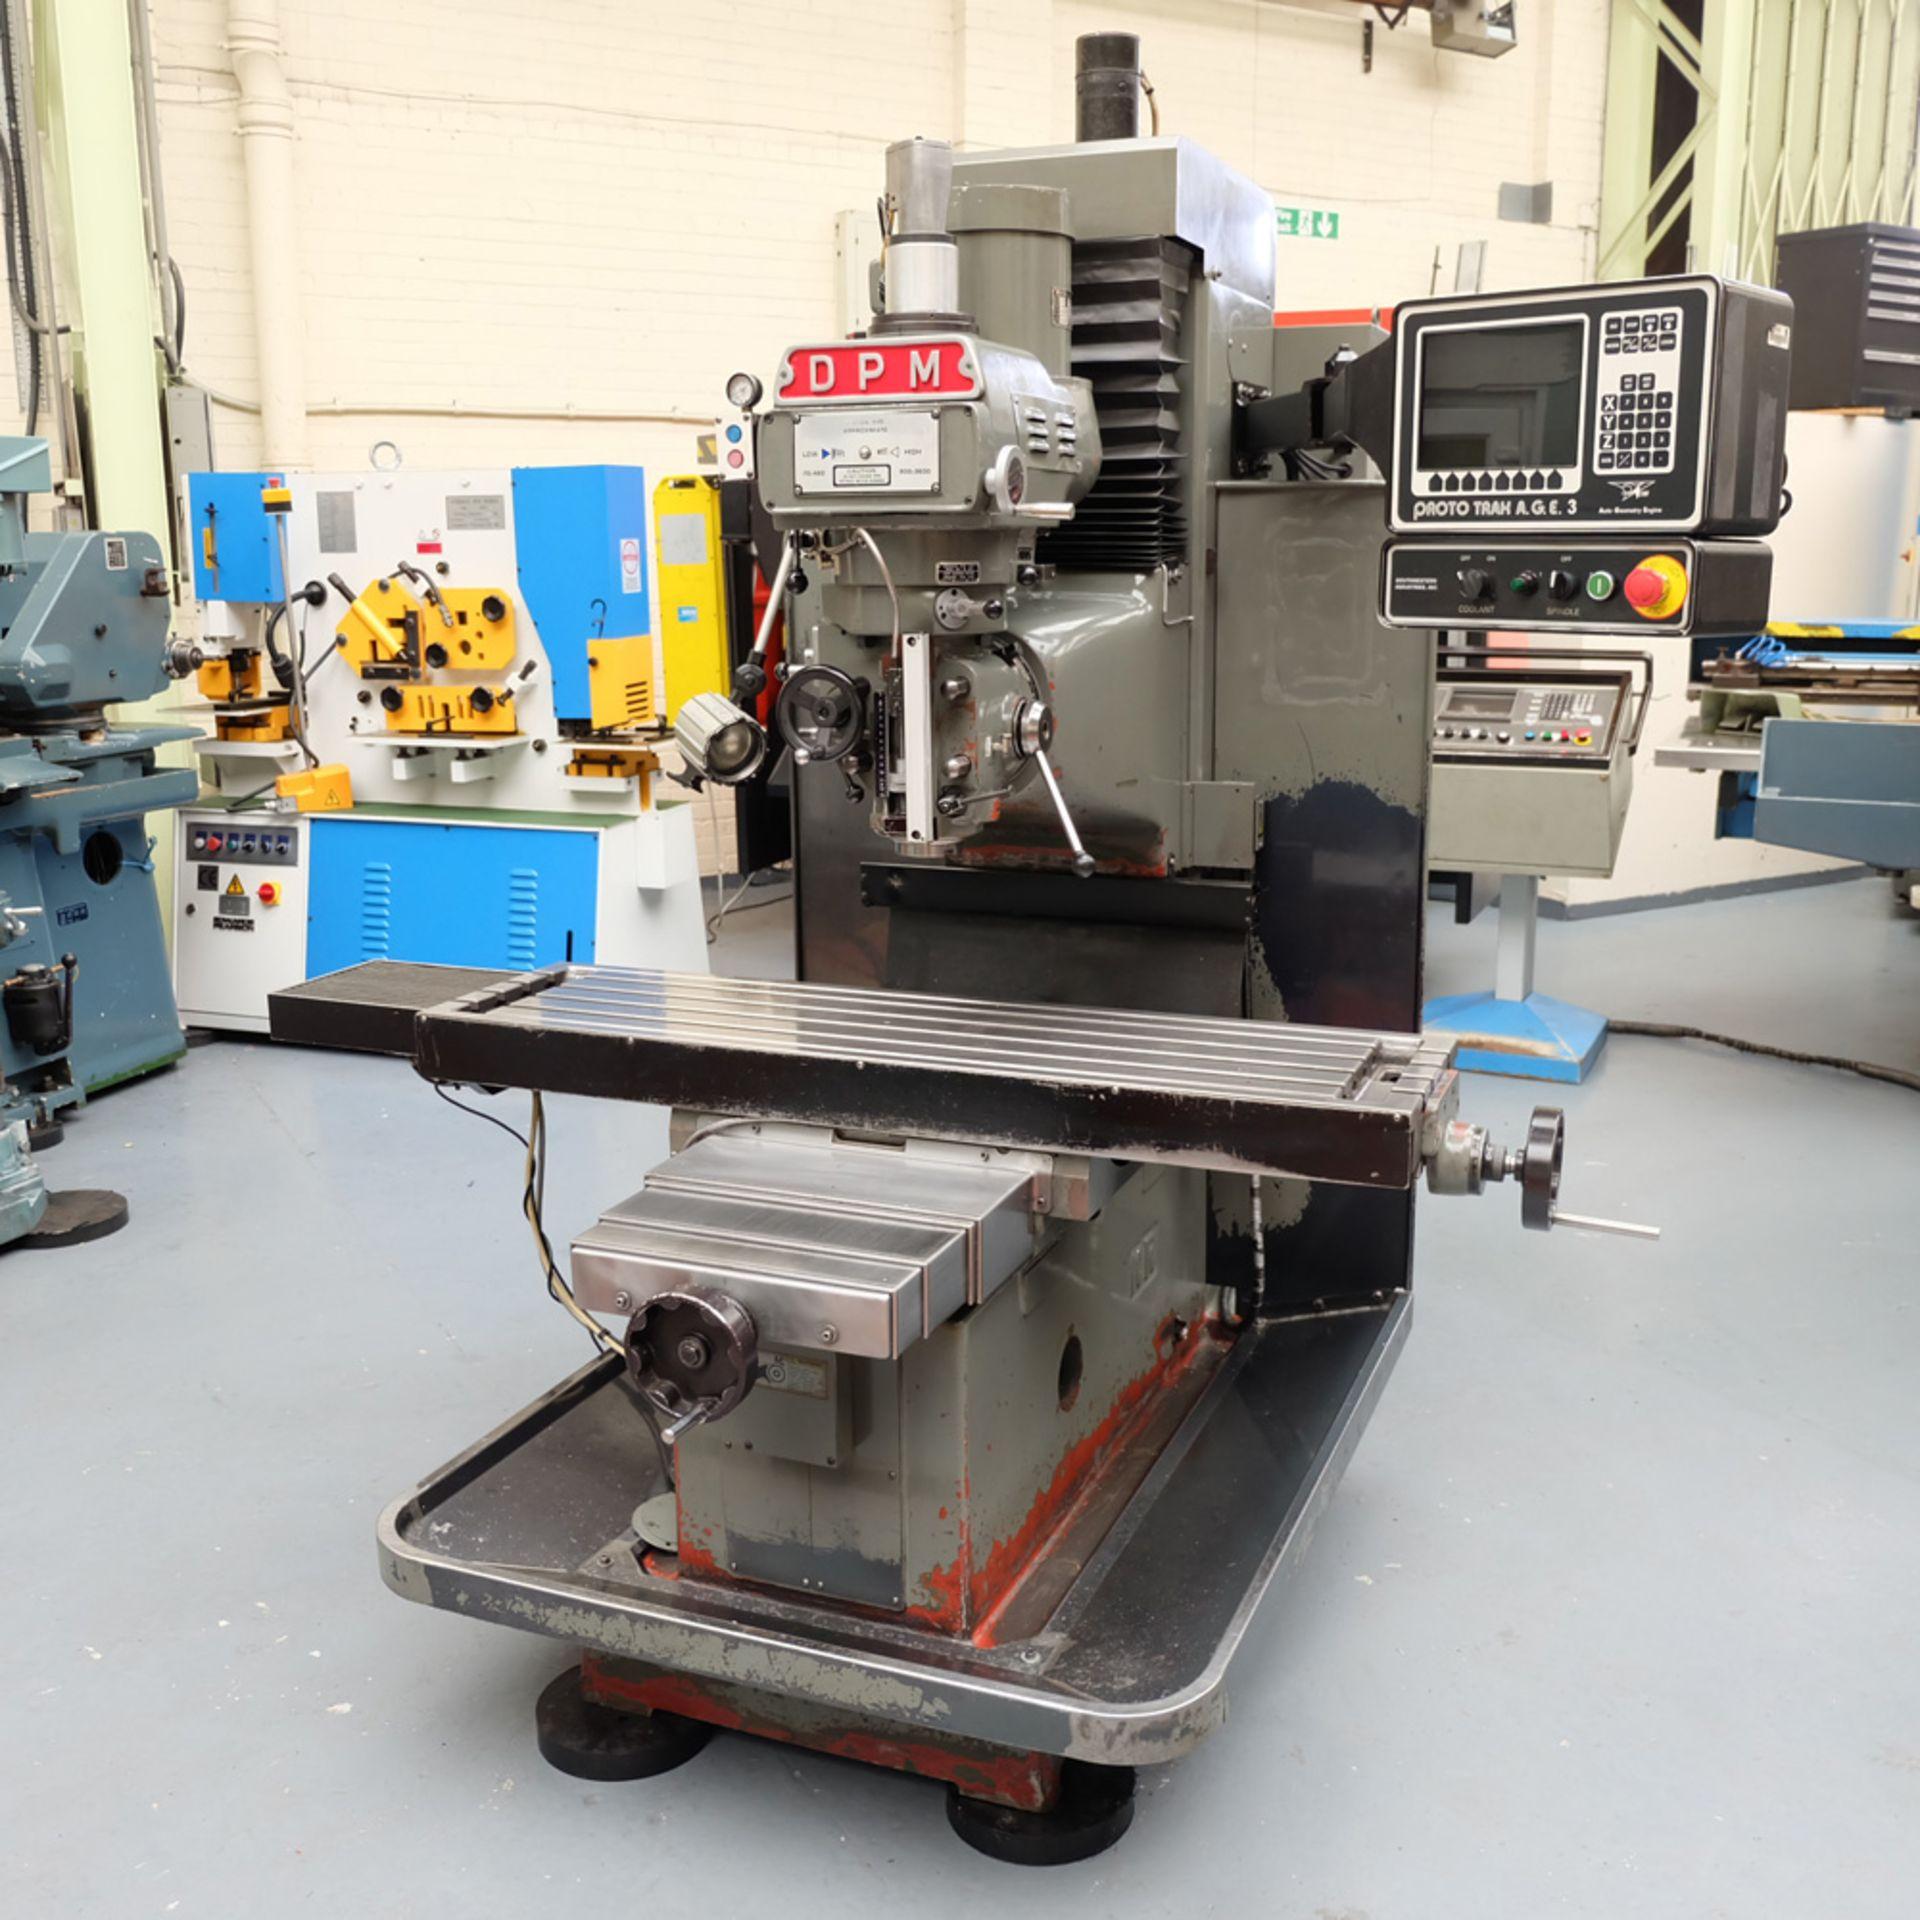 XYZ DPM Bed Mill with ProtoTRAK A.G.E. 3 Control. Prototrak A.G.E.